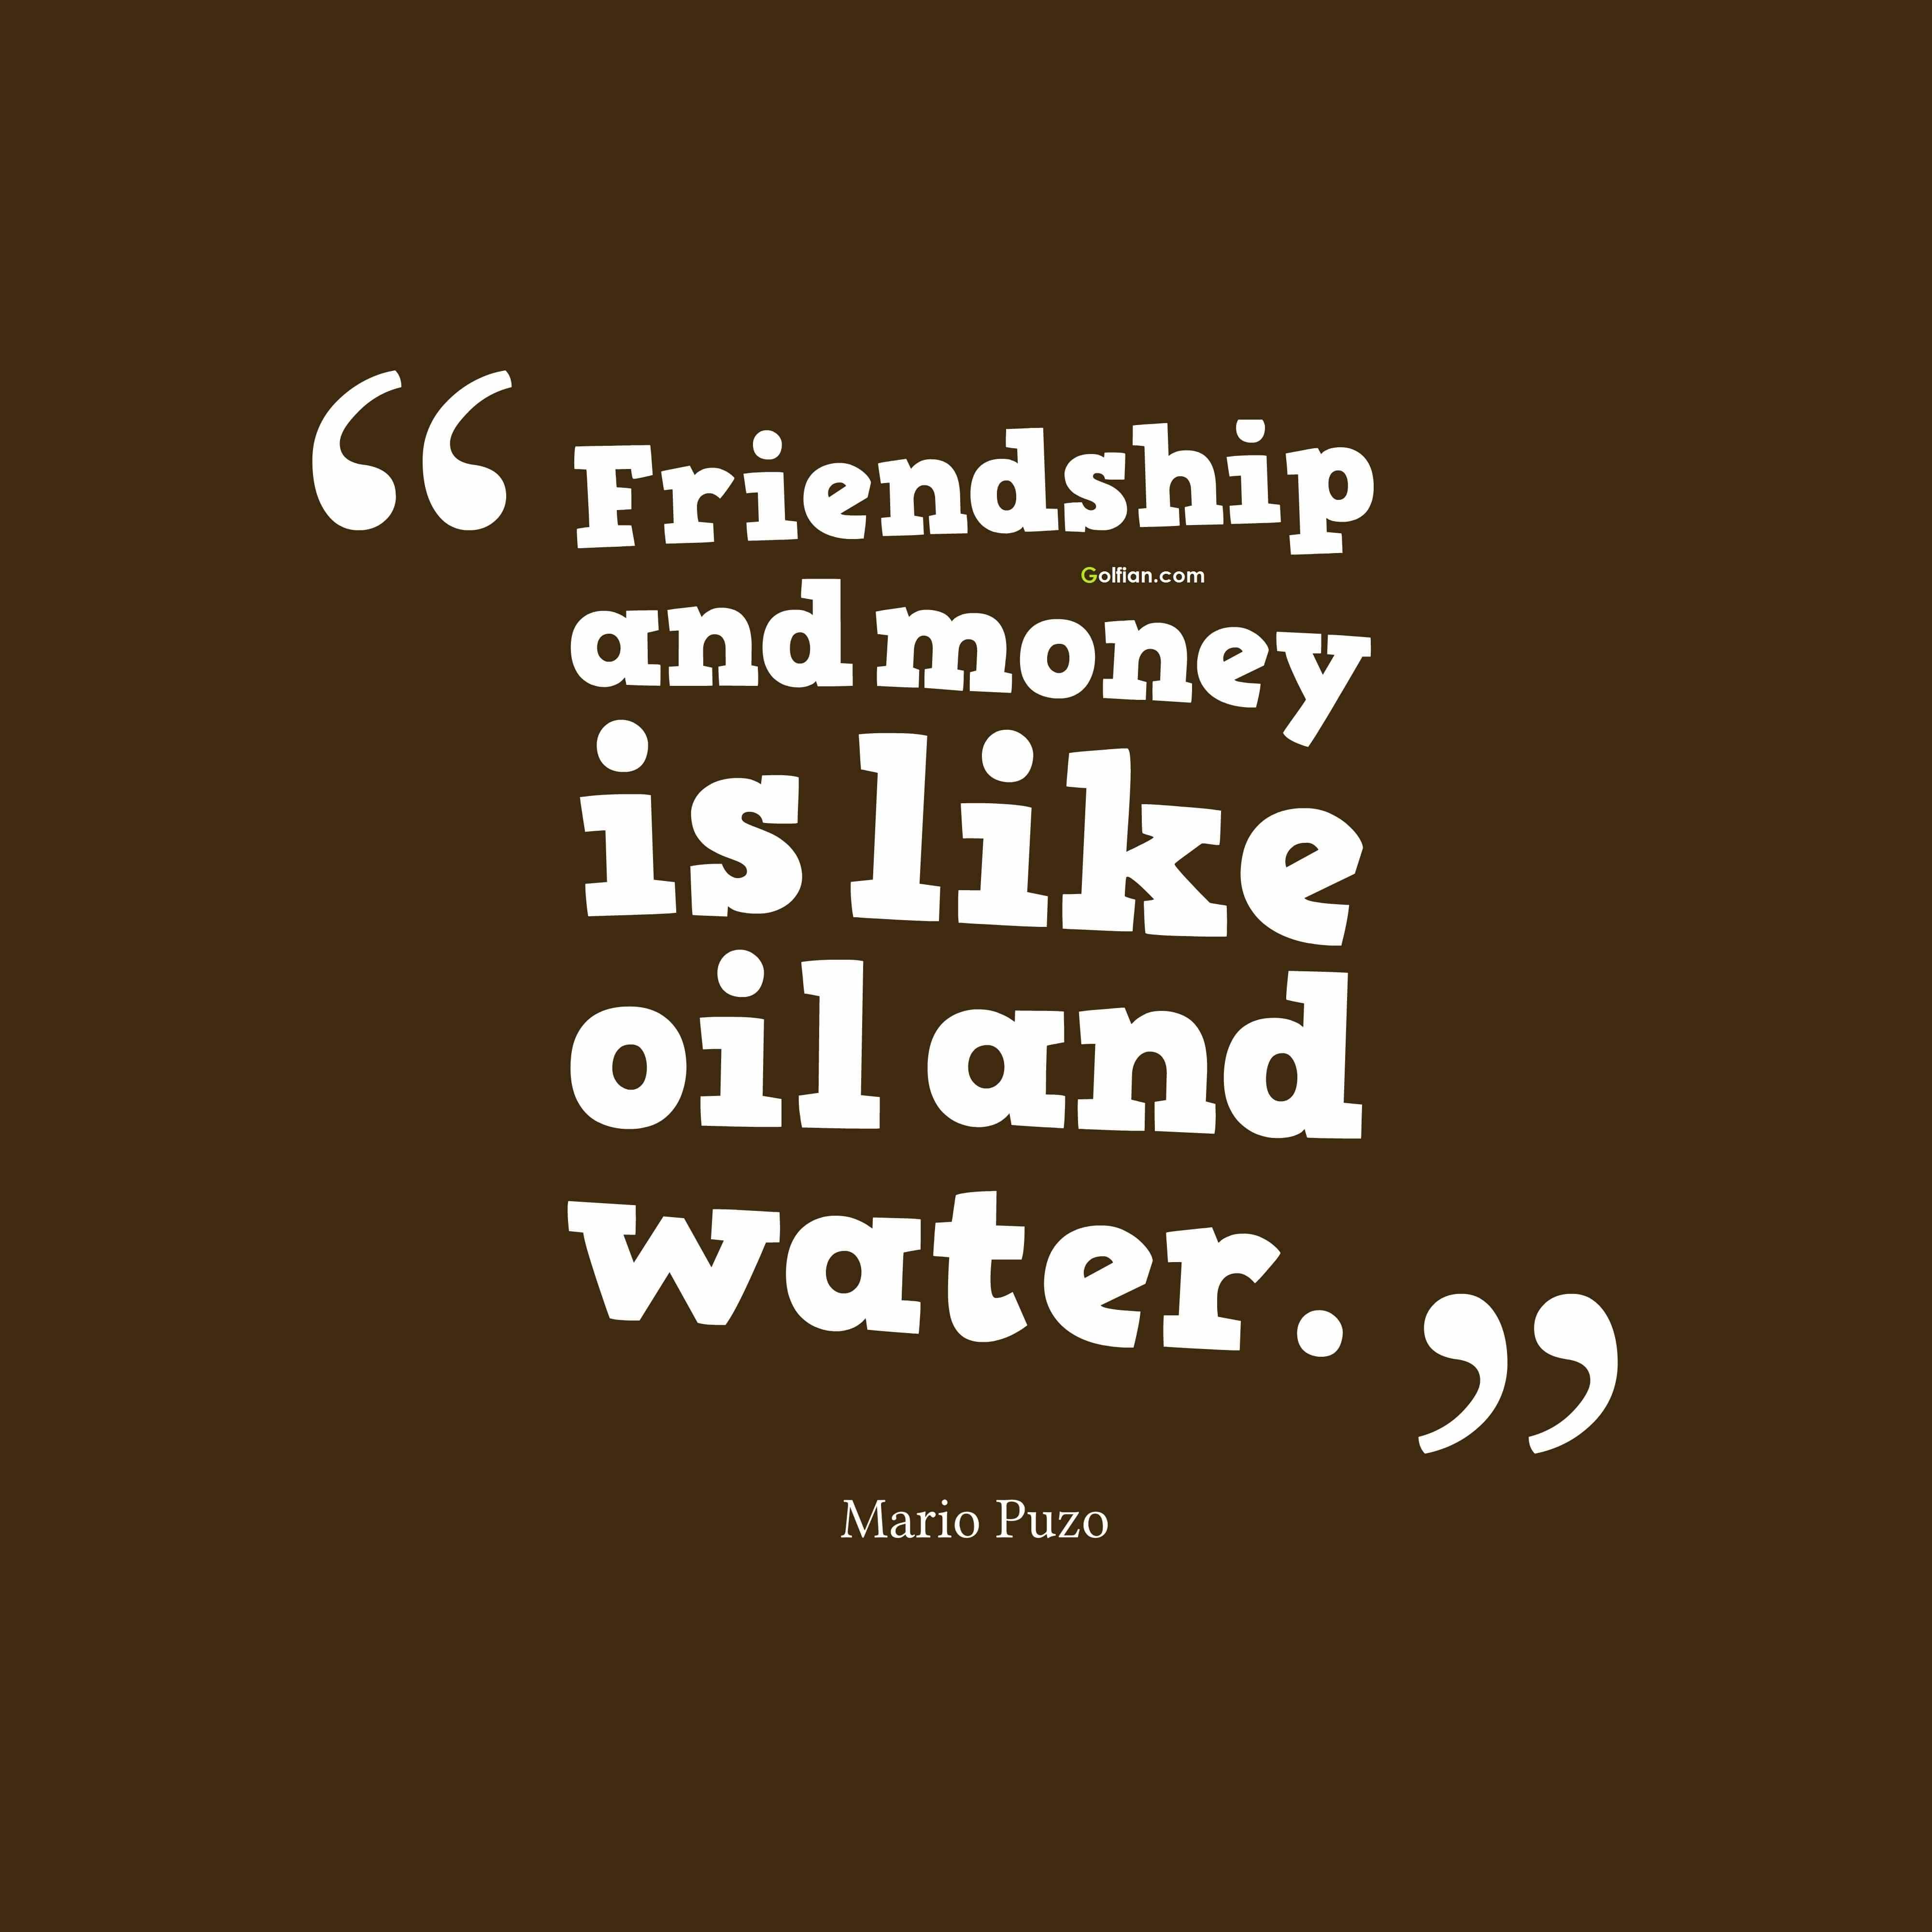 Broken Friendship Quotes Wallpapers - Wallpaper Cave